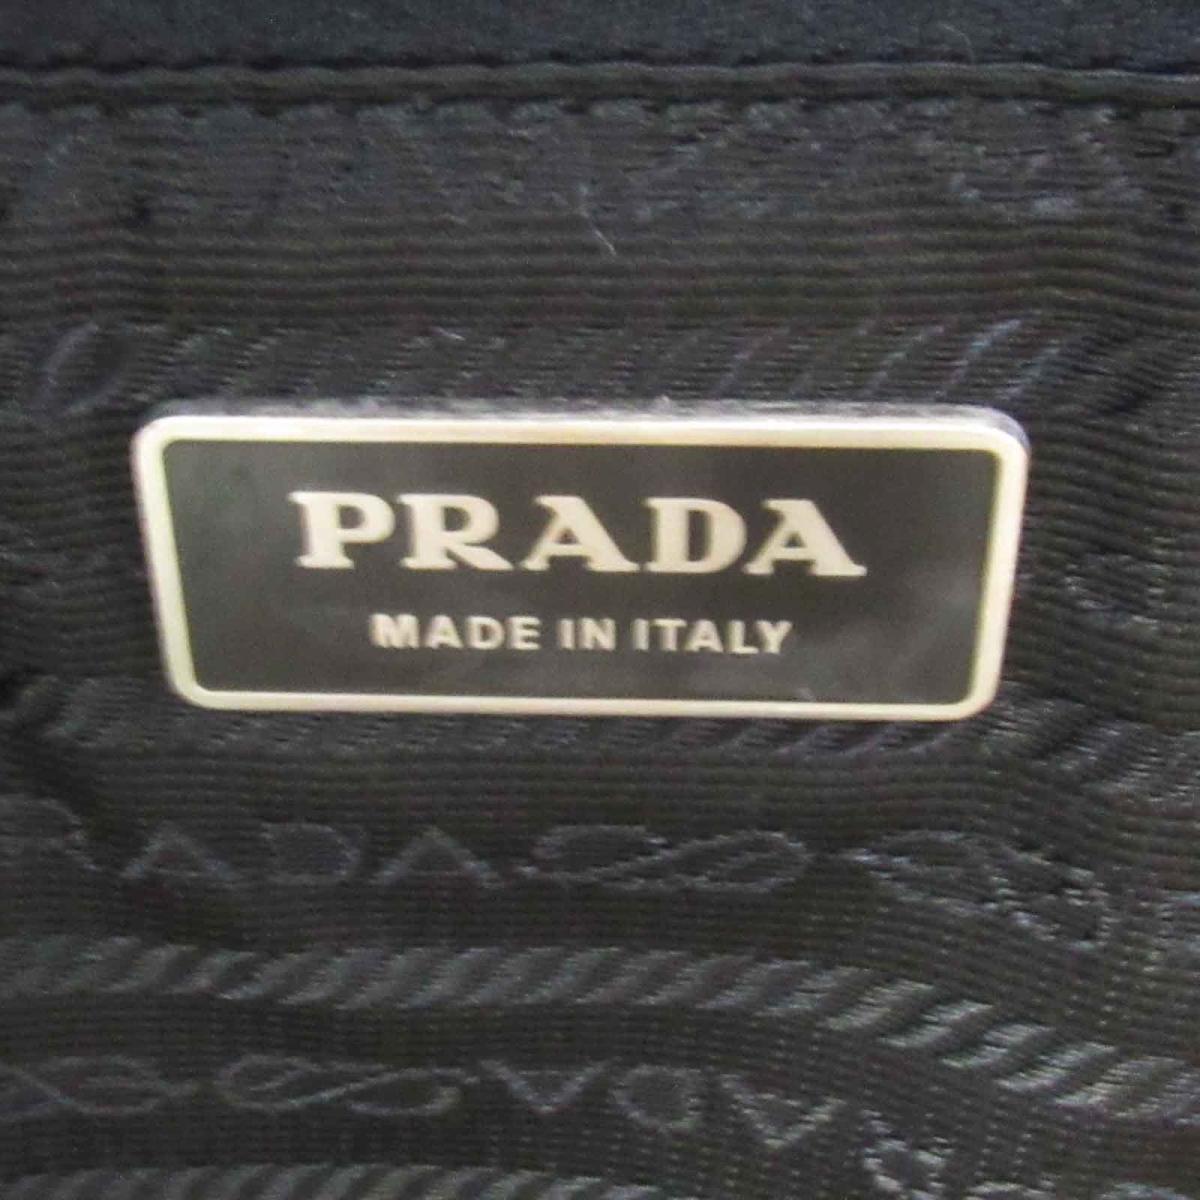 814a8a1db81d2e Prada nylon Boston bag bag men gap Dis nylon x サフィアーノレザーブラック | Trip to PRADA  BRANDOFF brand off-brand brand bag back Boston bag is large- ...